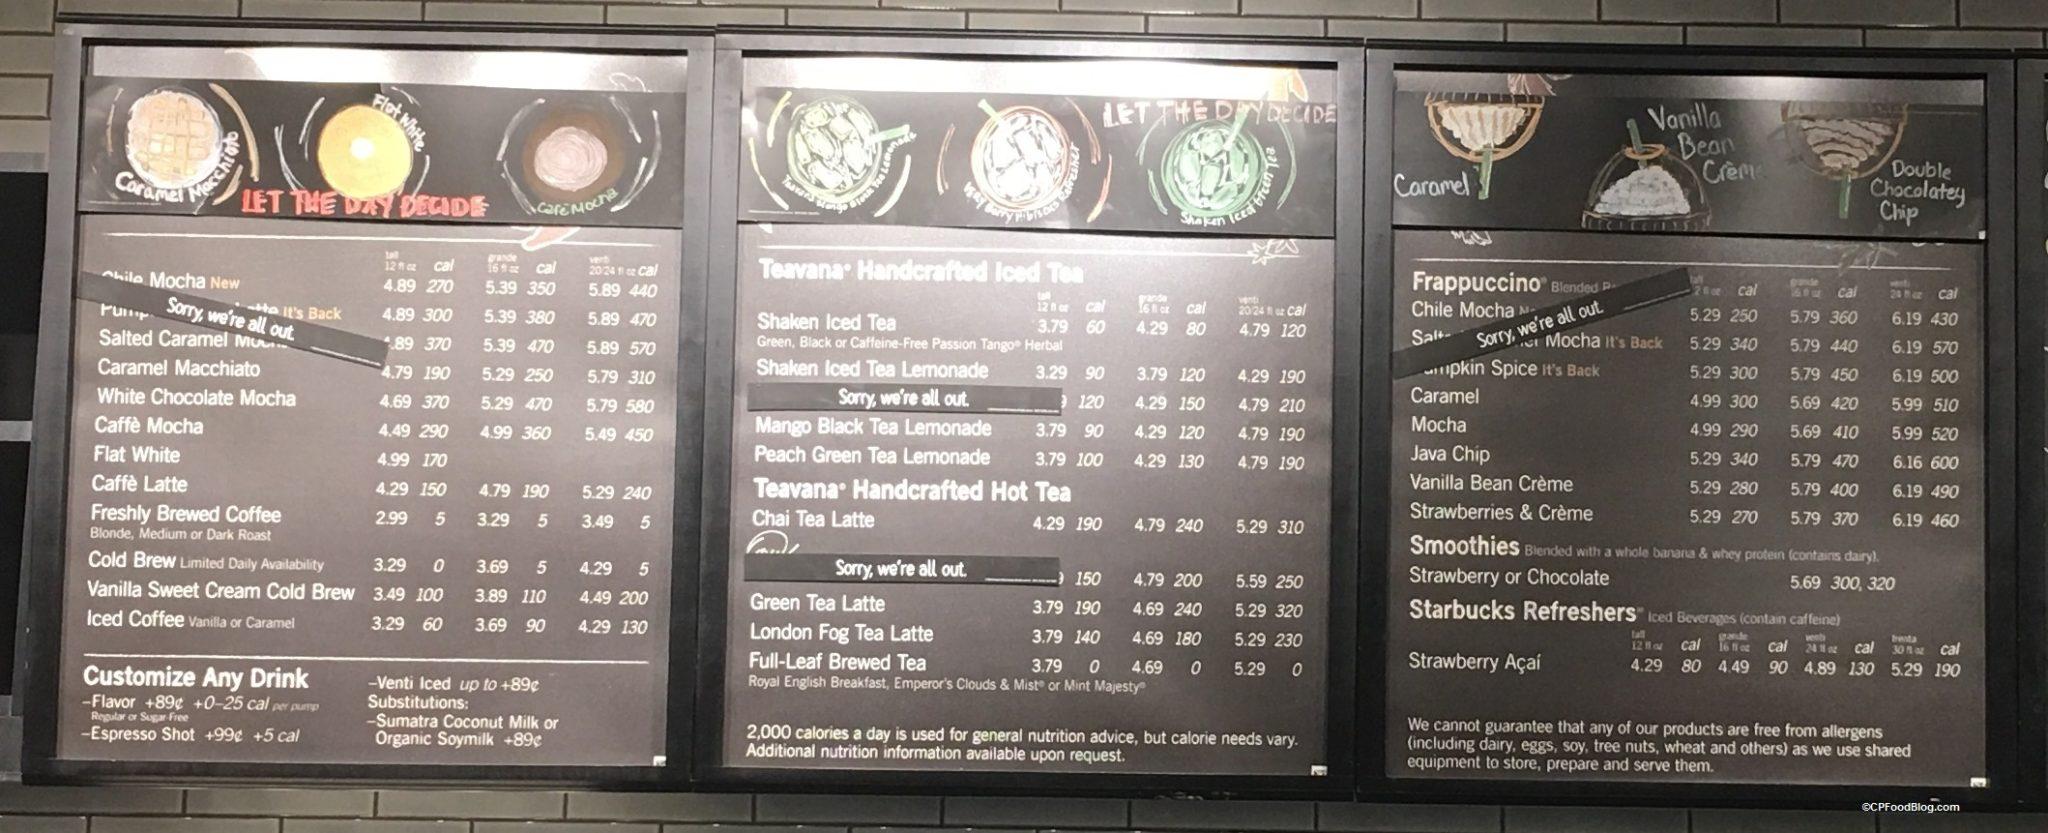 170414 Kings Island Starbucks Menu